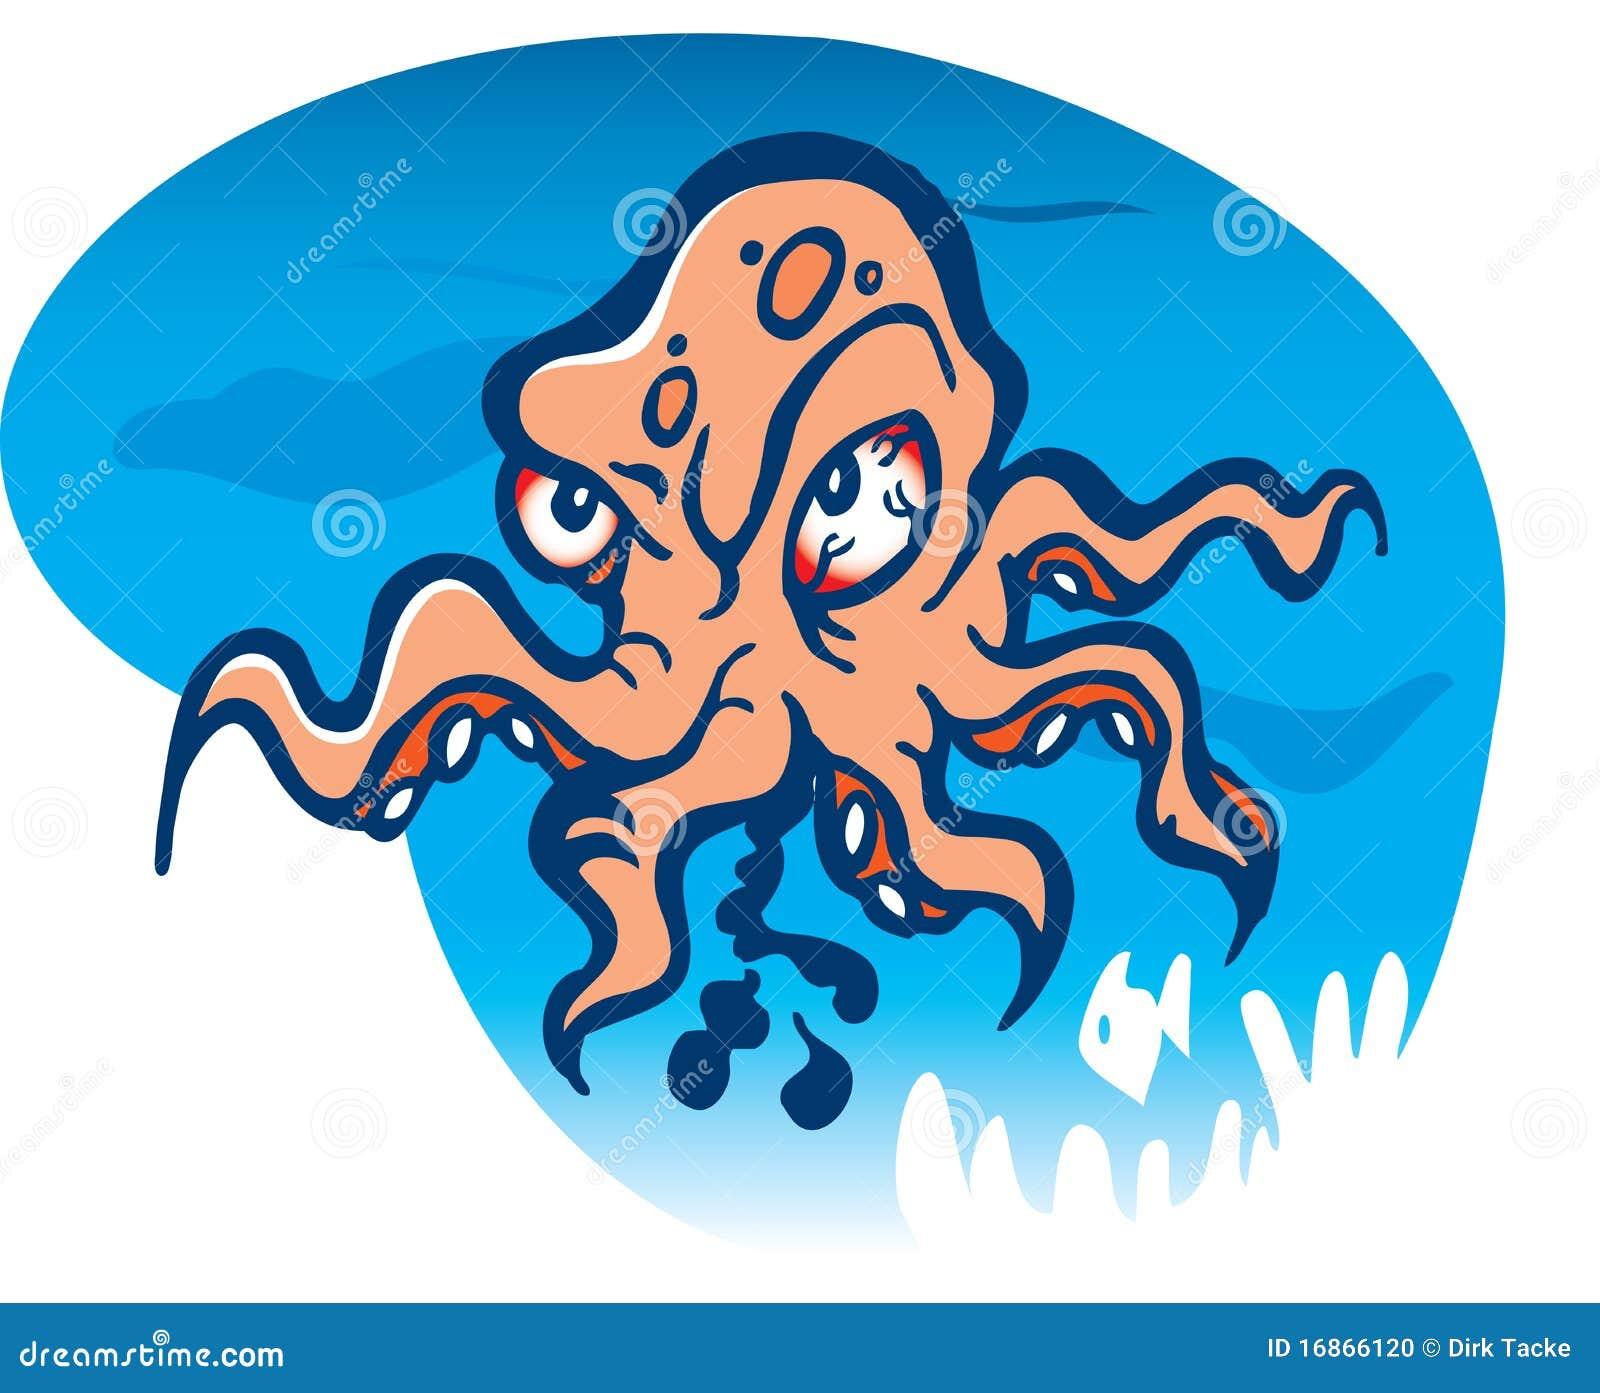 angry octopus cartoon stock vector illustration of clip art octopus free clipart octapus